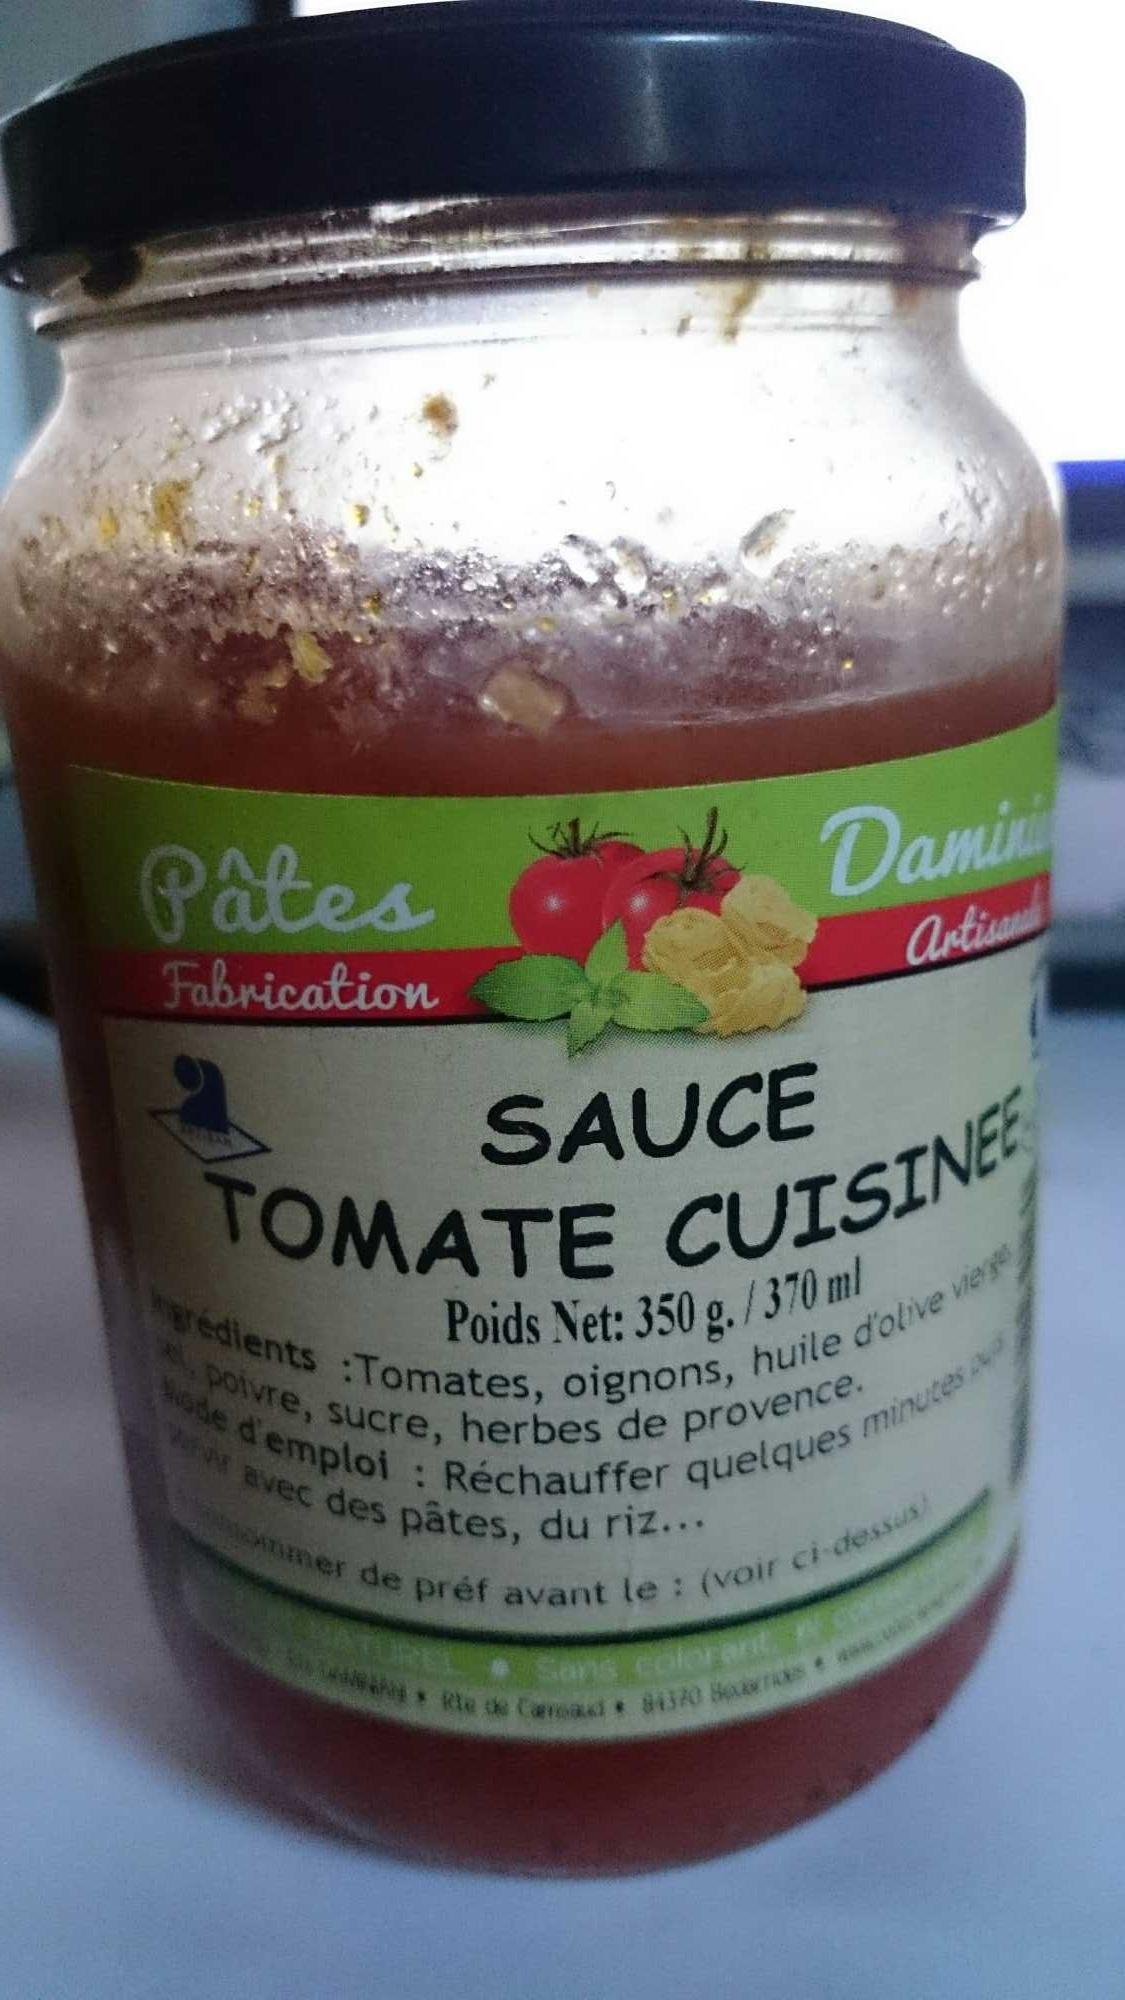 Sauce tomate cuisin e pates daminiani 350g for Sauce tomate cuisinee